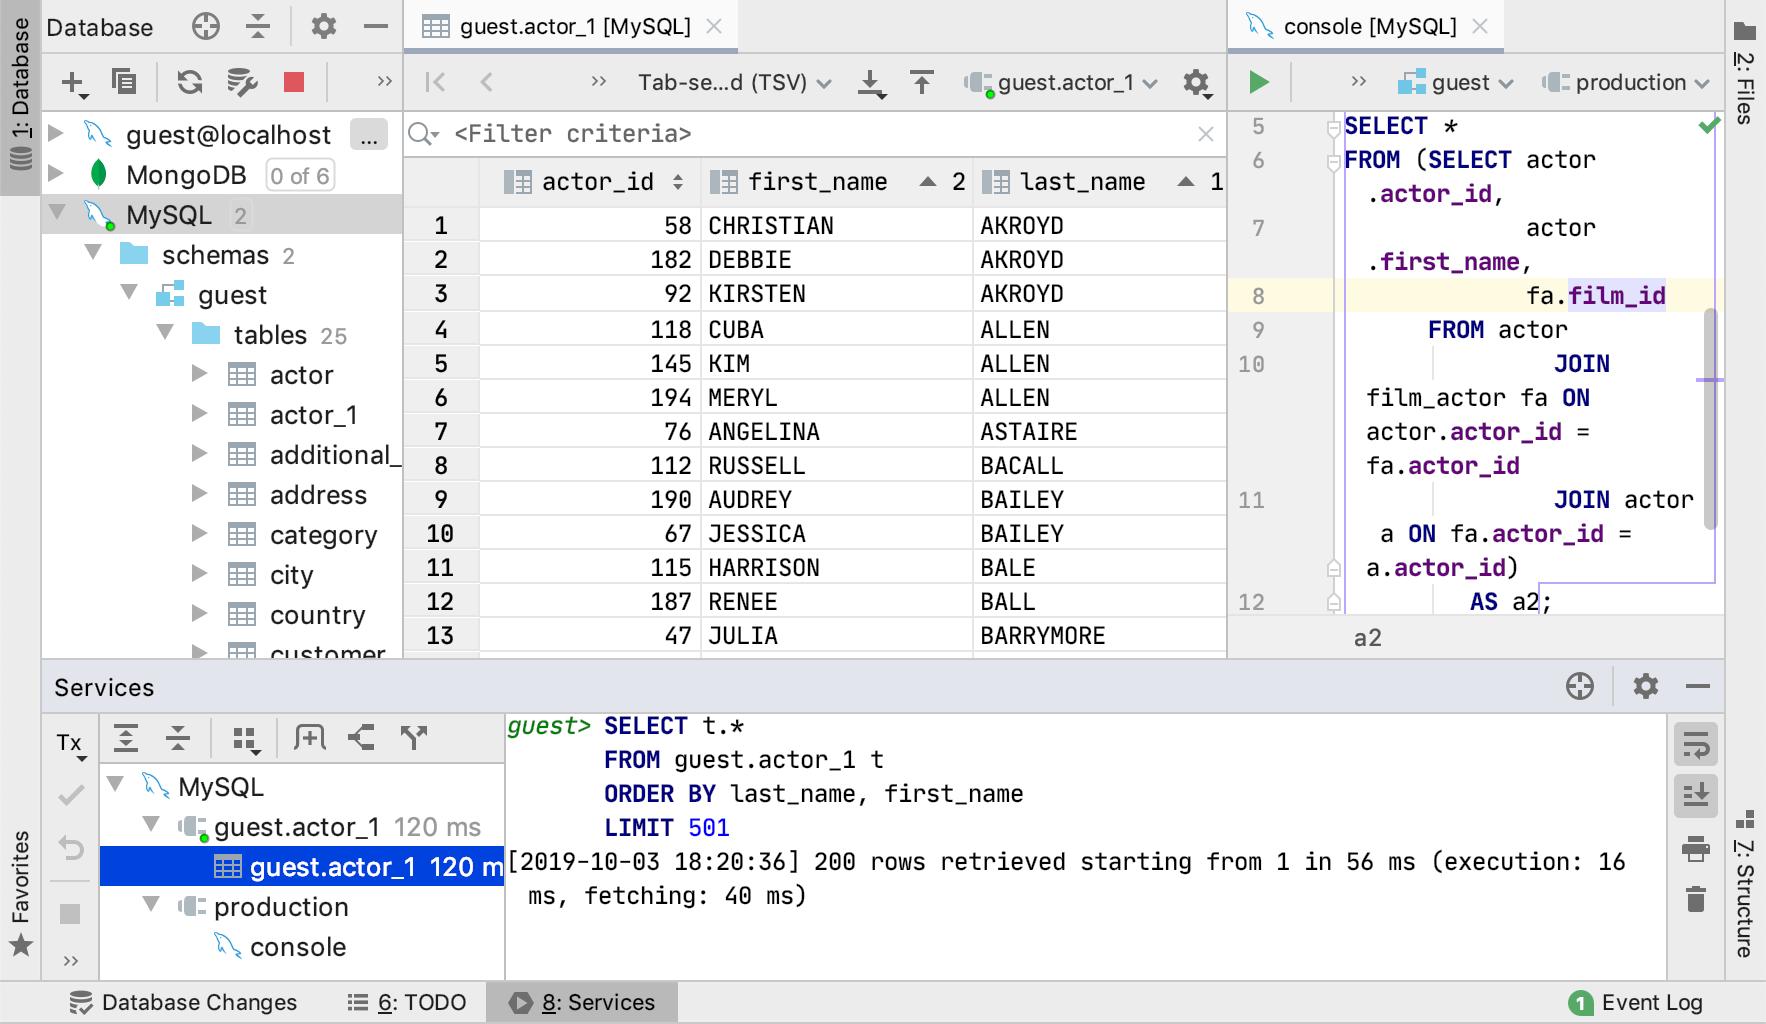 Data editor with tool windows